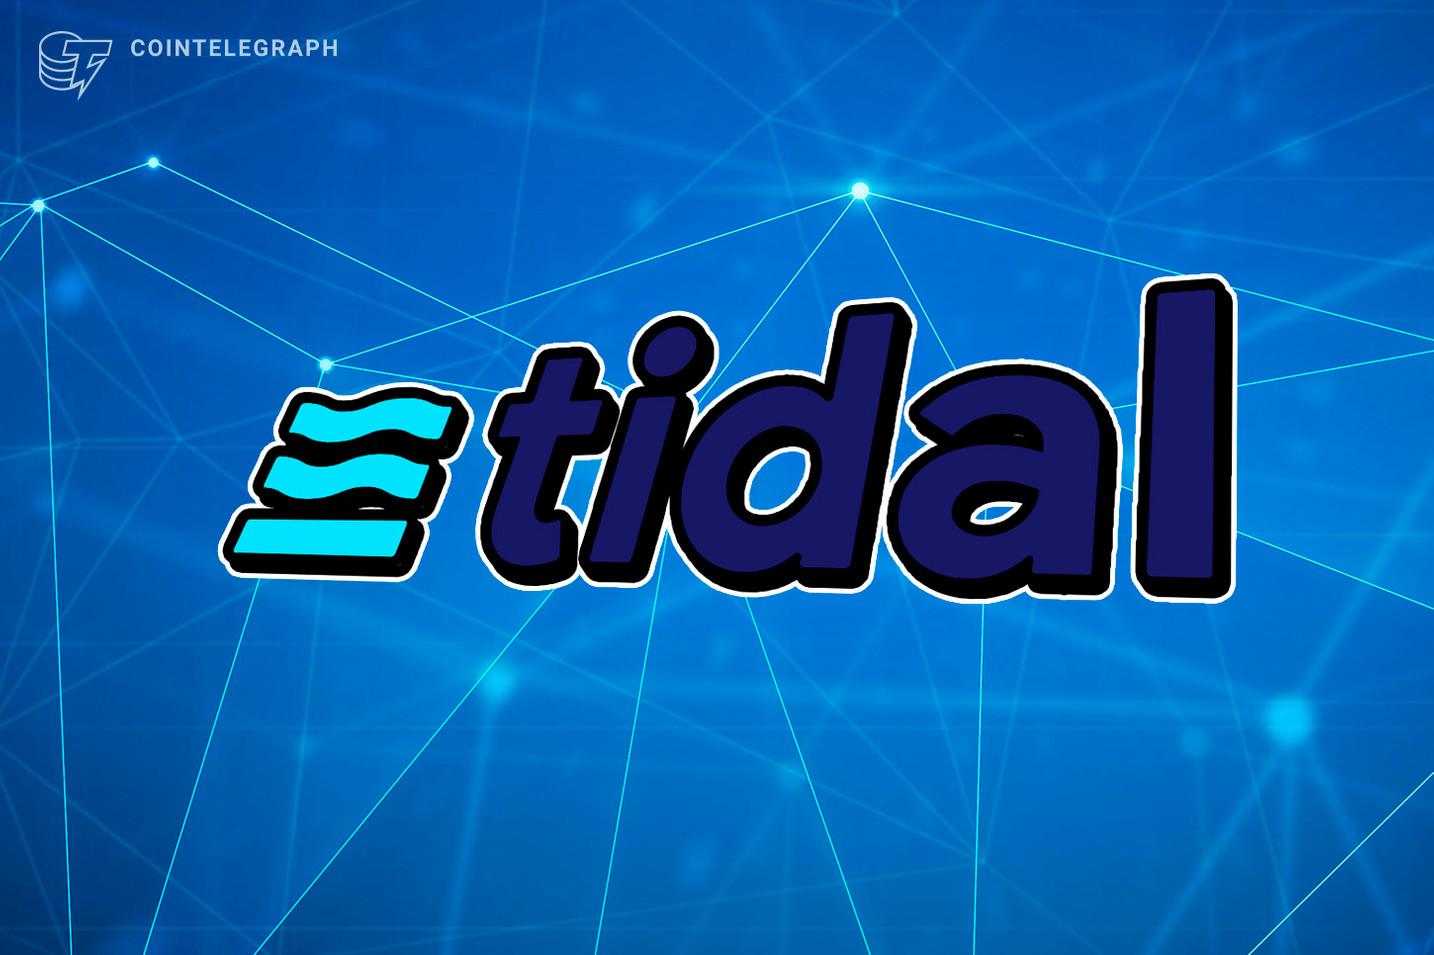 Insurance marketplace Tidal Finance raises additional $1.8 million